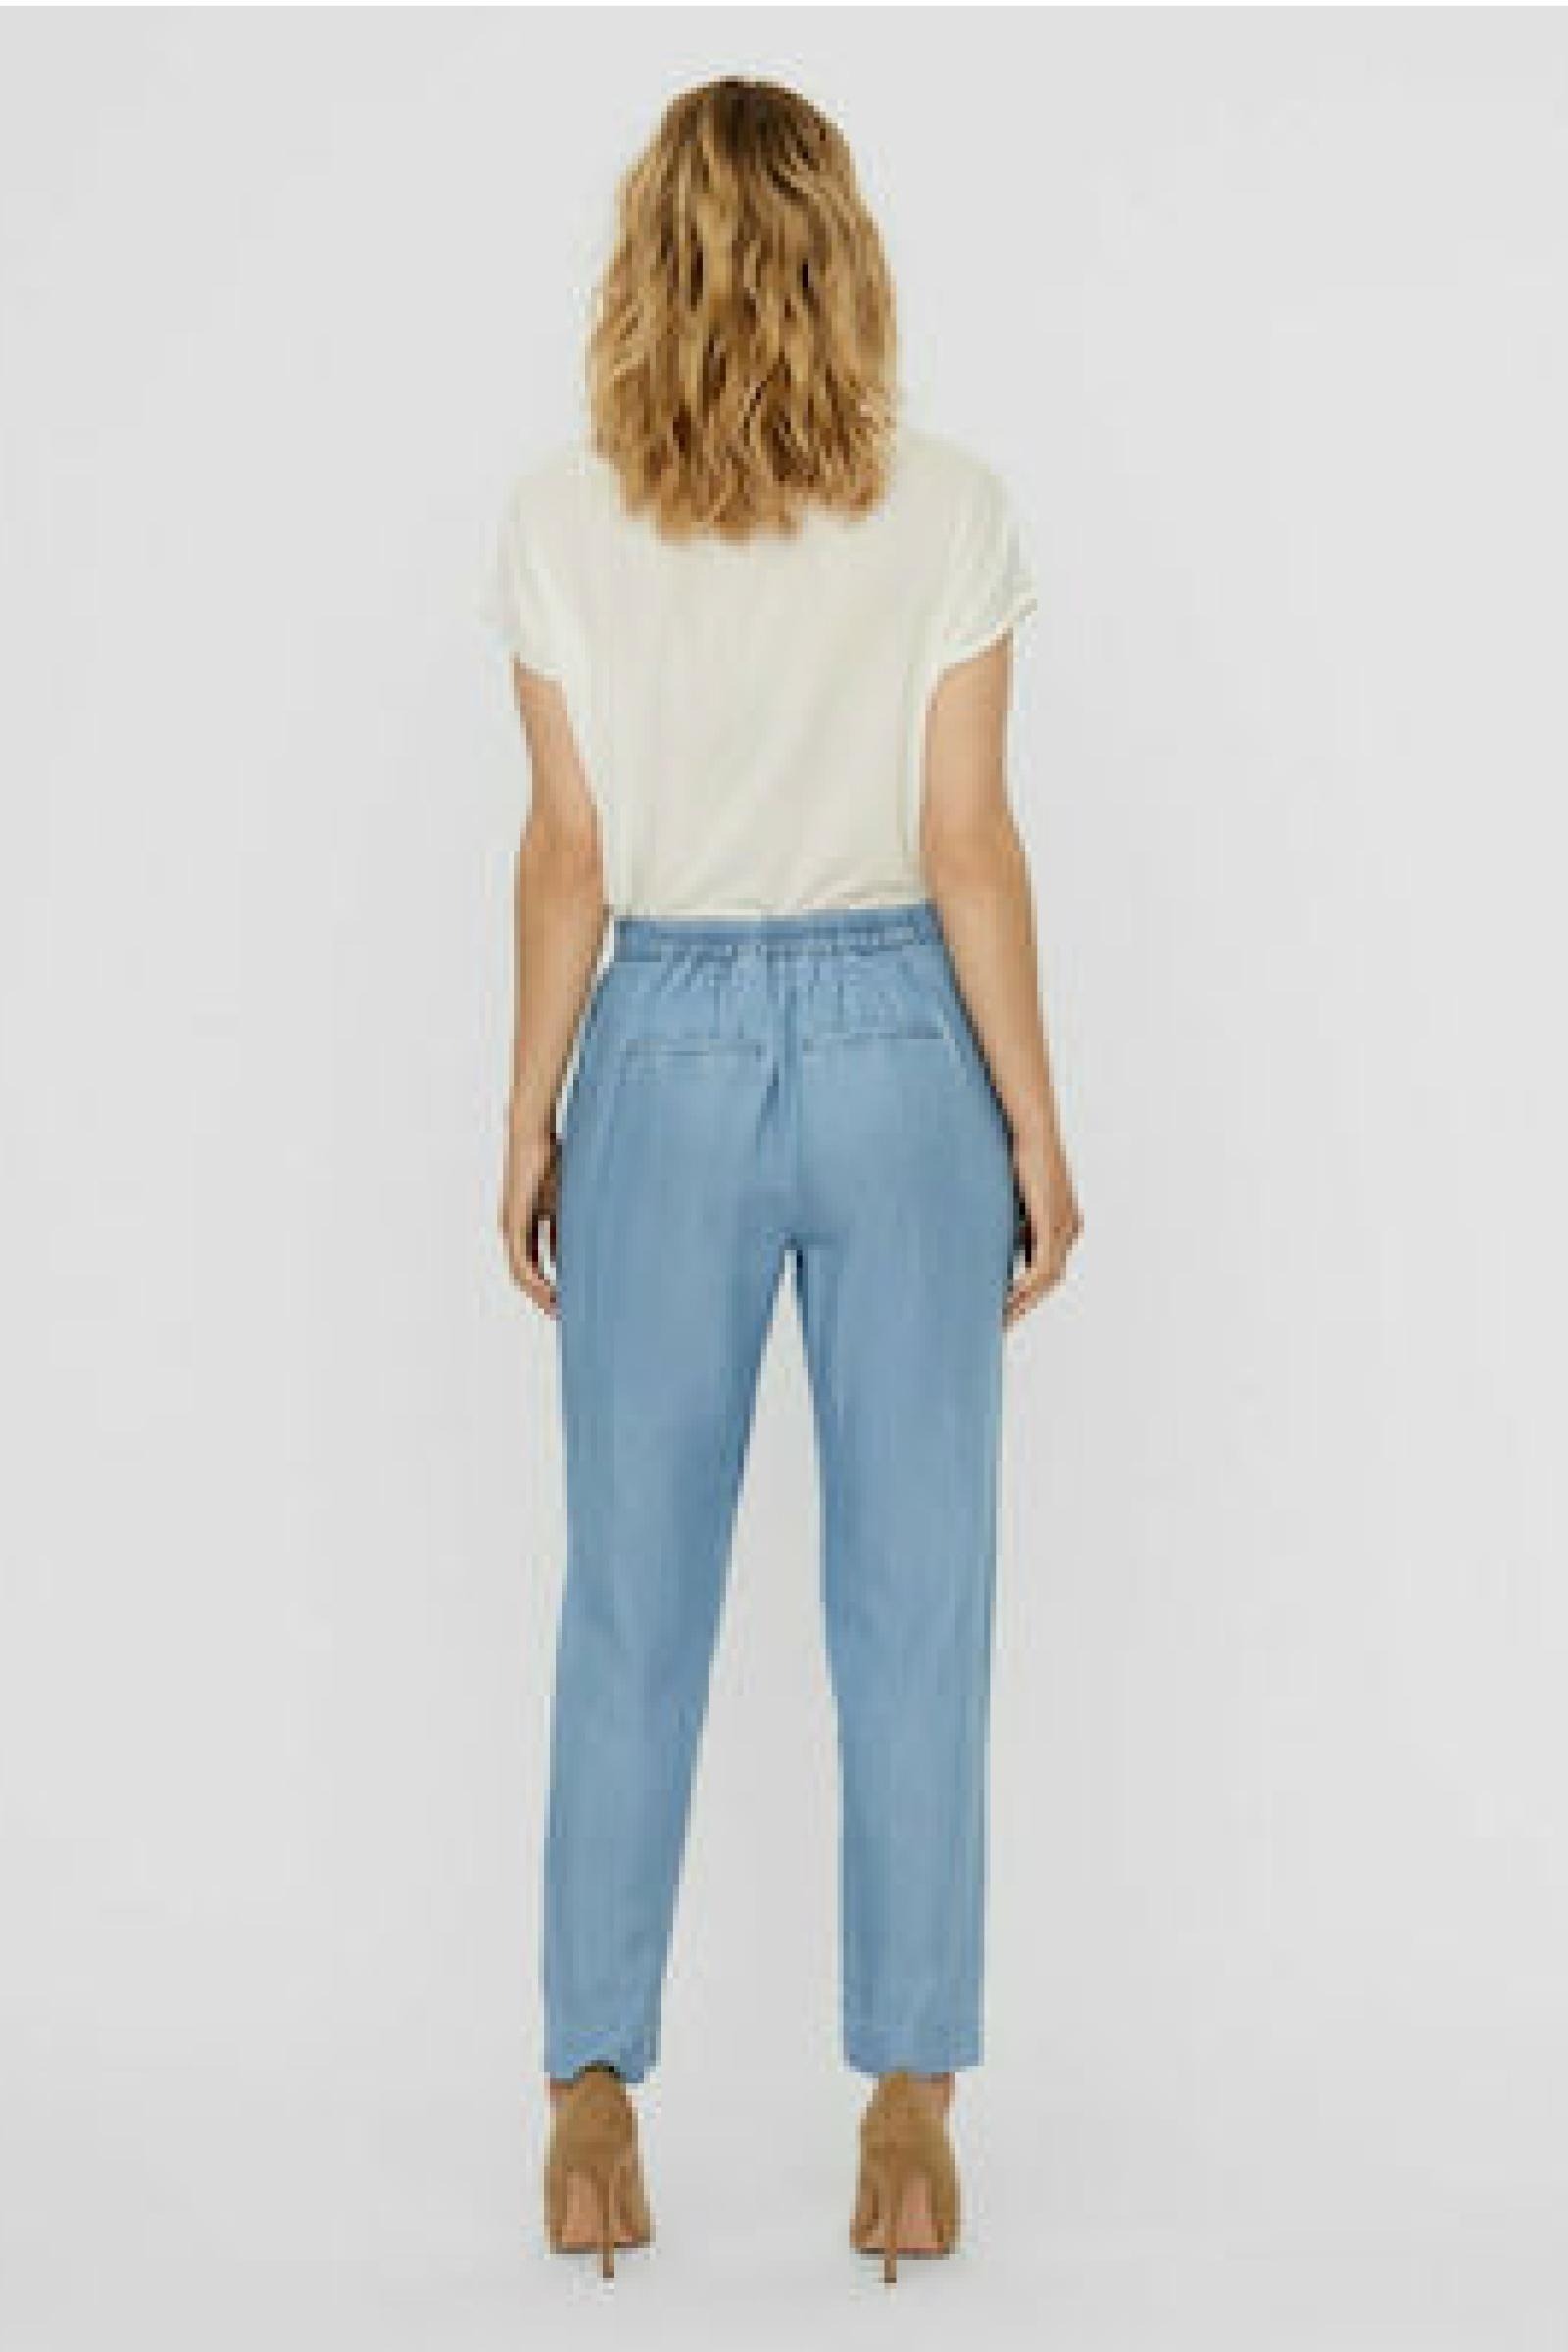 VERO MODA Women's Trousers VERO MODA | Trousers | 10242263Light Blue Denim